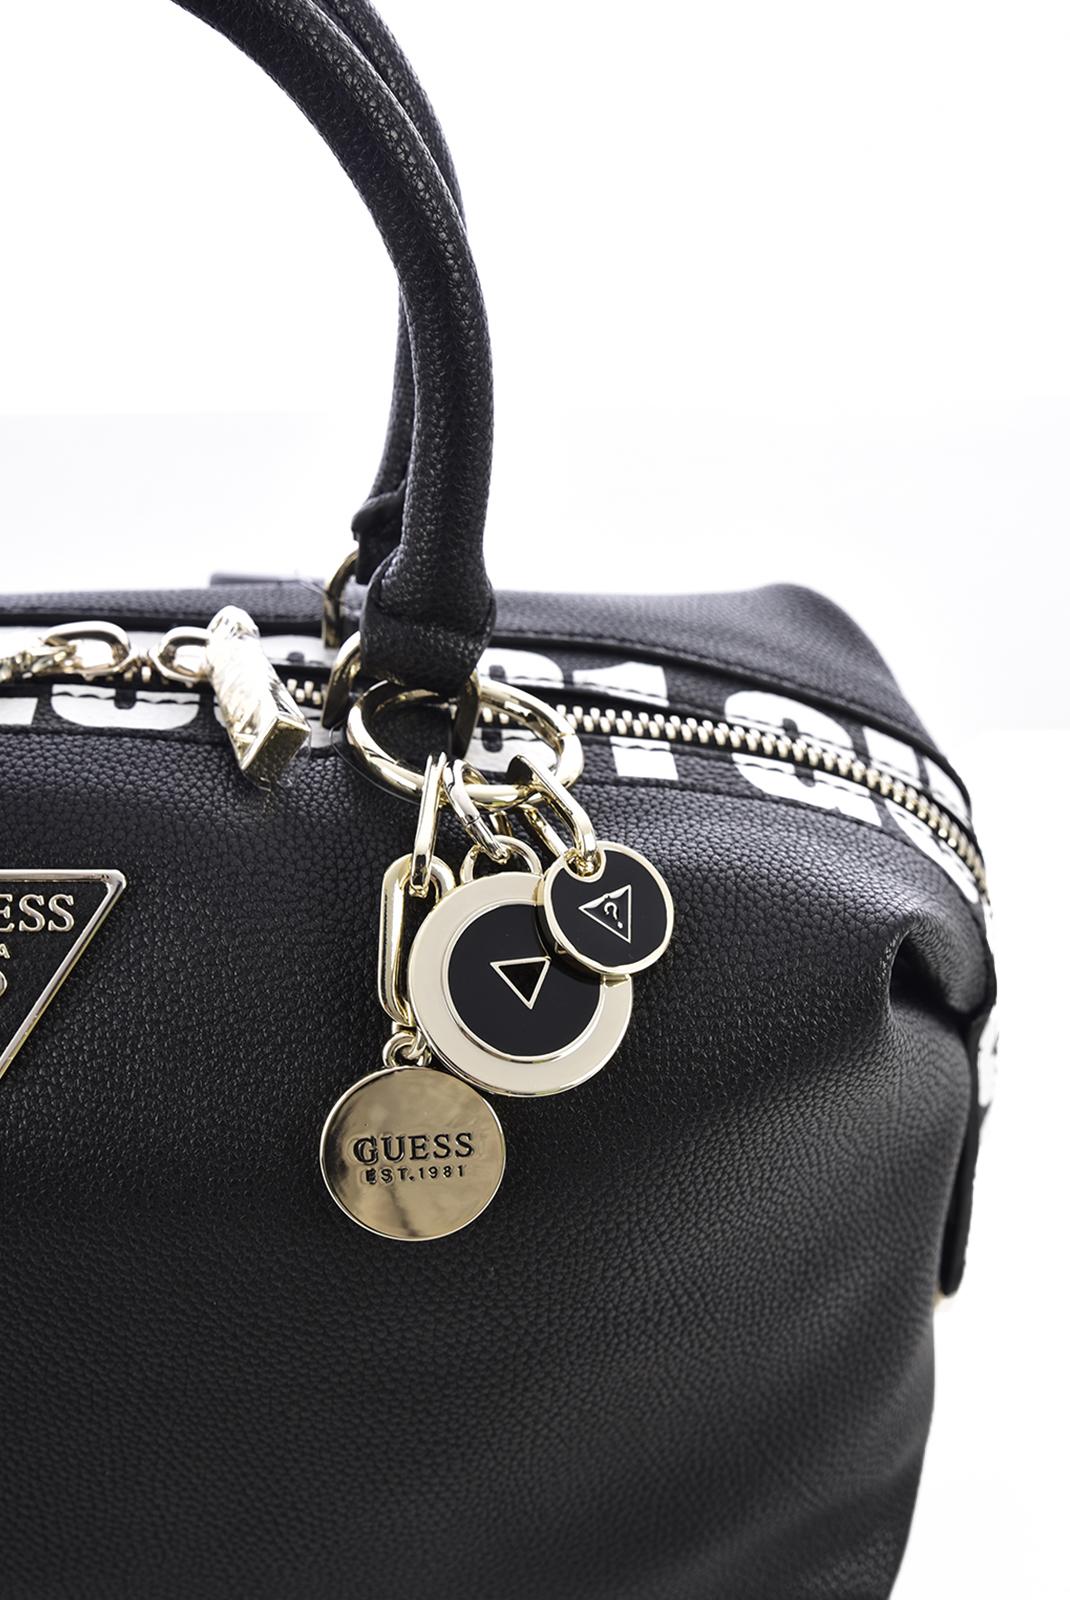 Sacs à Main Femme Guess jeans HWVG76 65060 Narita BLACK